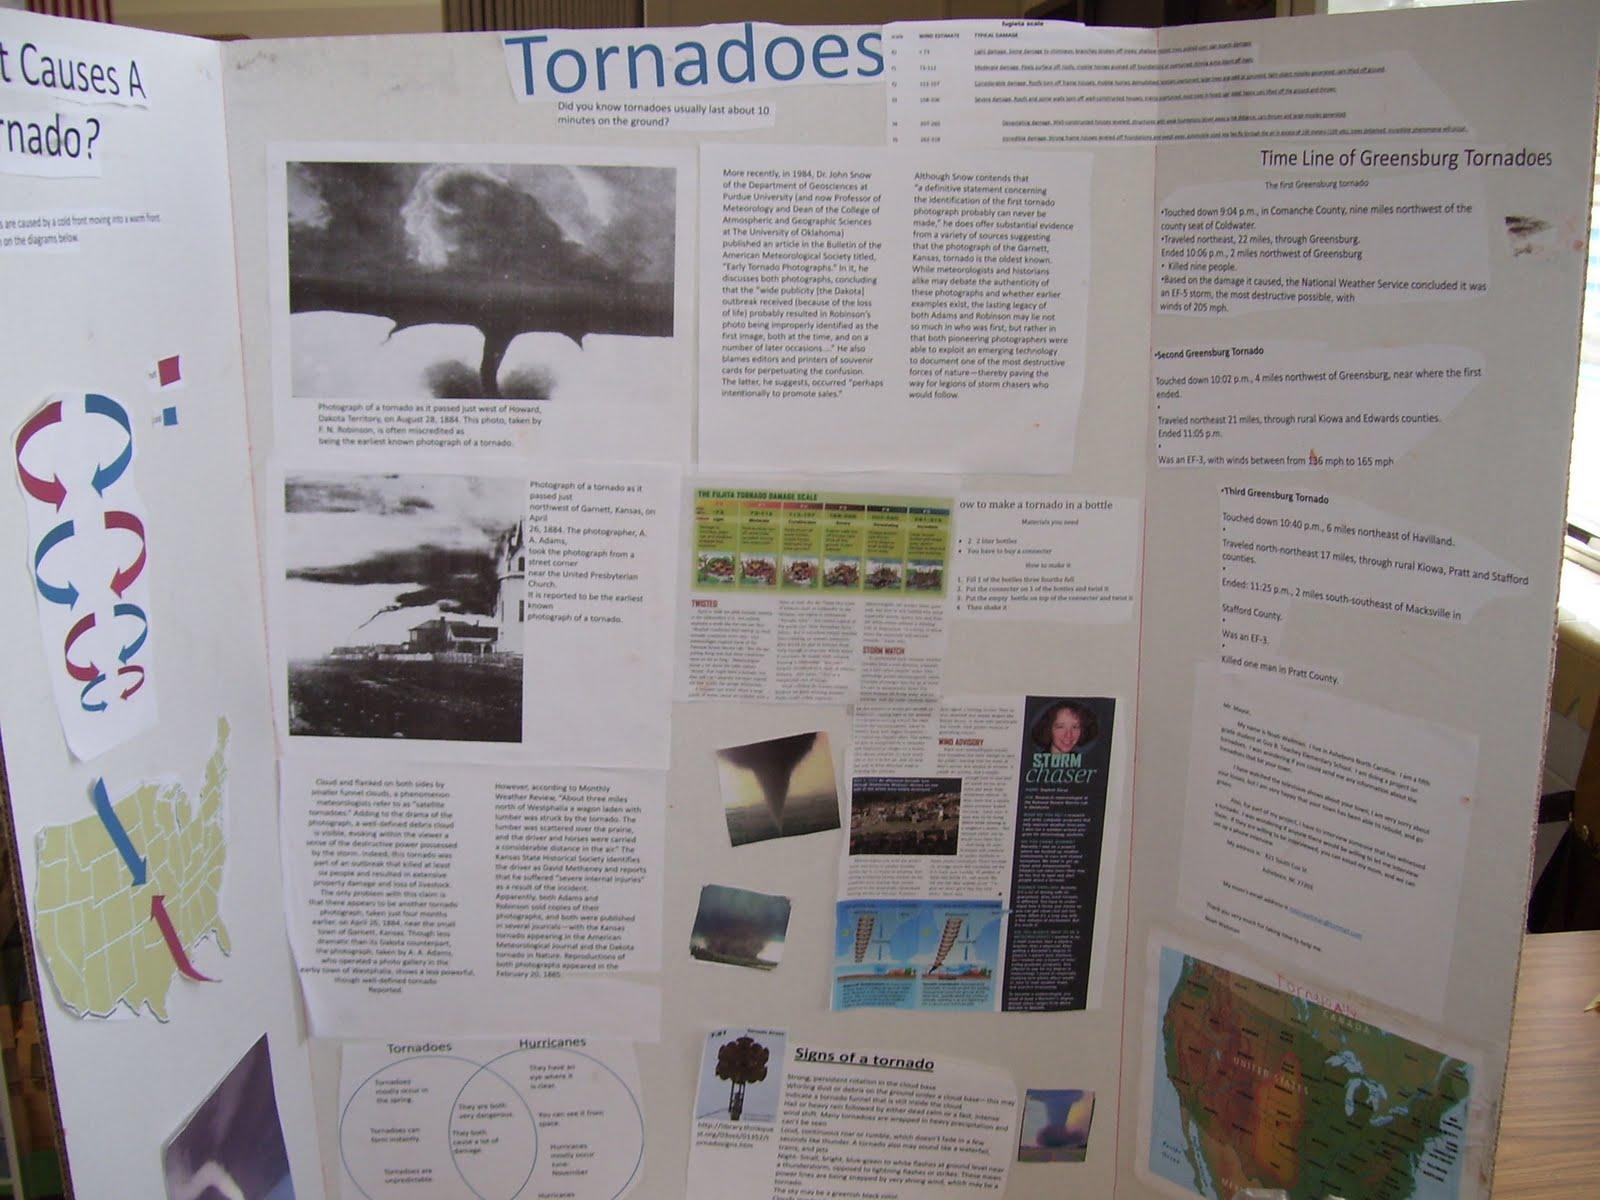 tornado science fair project Title: tornado in a box author: joshua r escobedo subject: cssf 2005 project summary keywords: cssf, california state science fair, project summary.